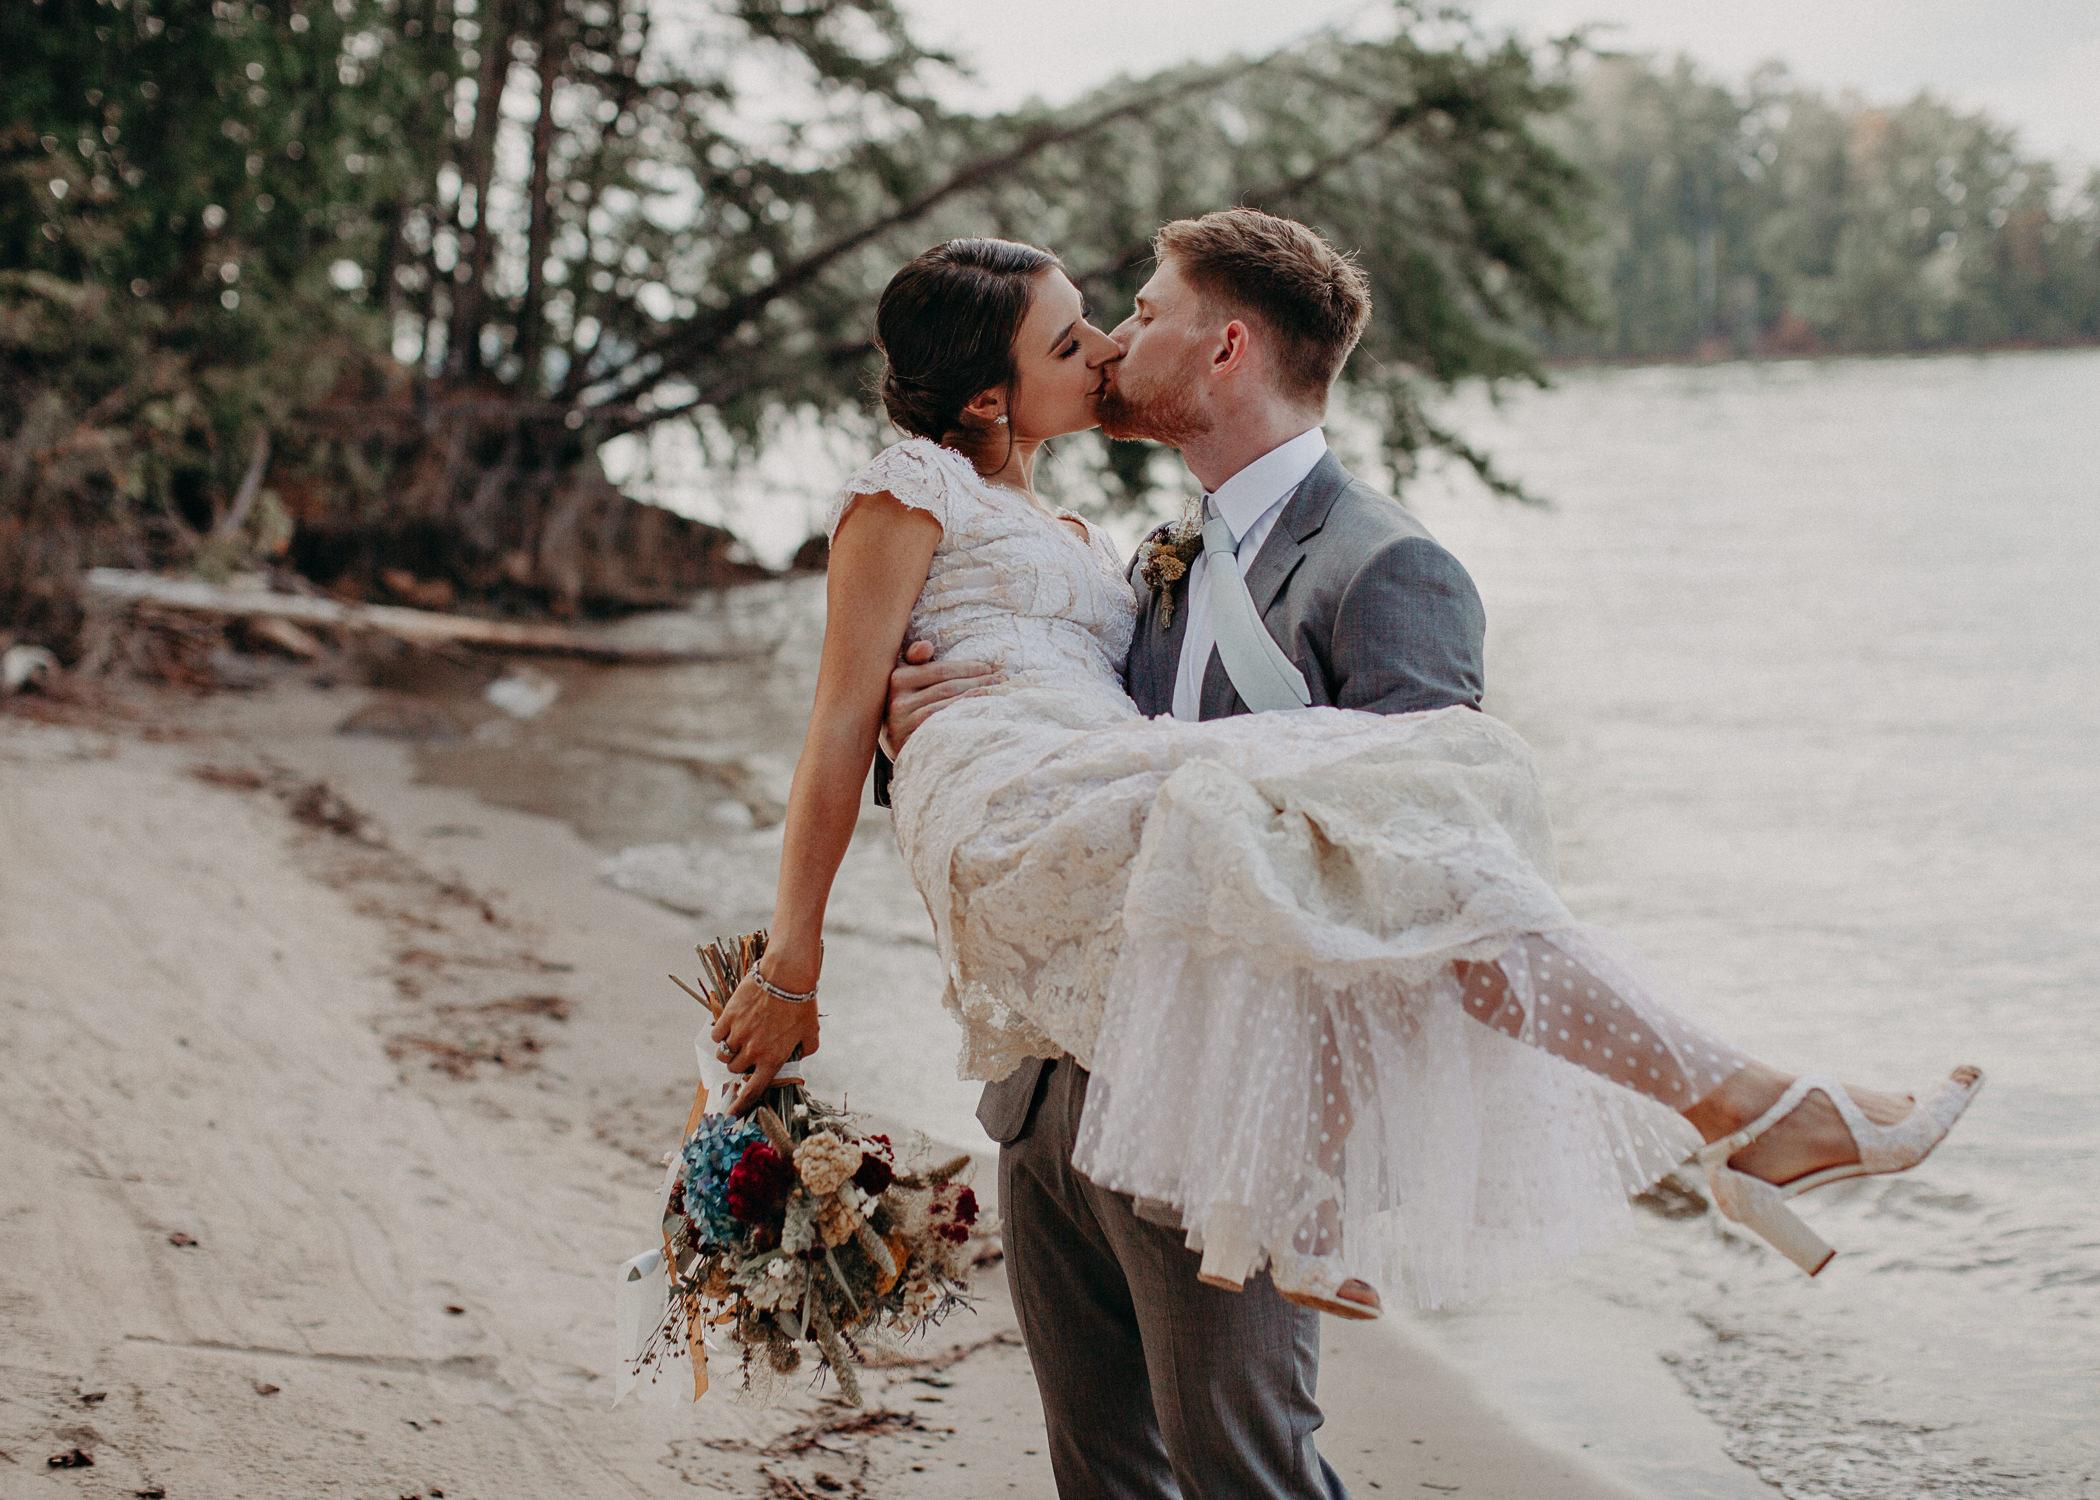 52 Bride & Groom Portraits before the ceremony on wedding day - Atlanta Wedding Photographer .jpg